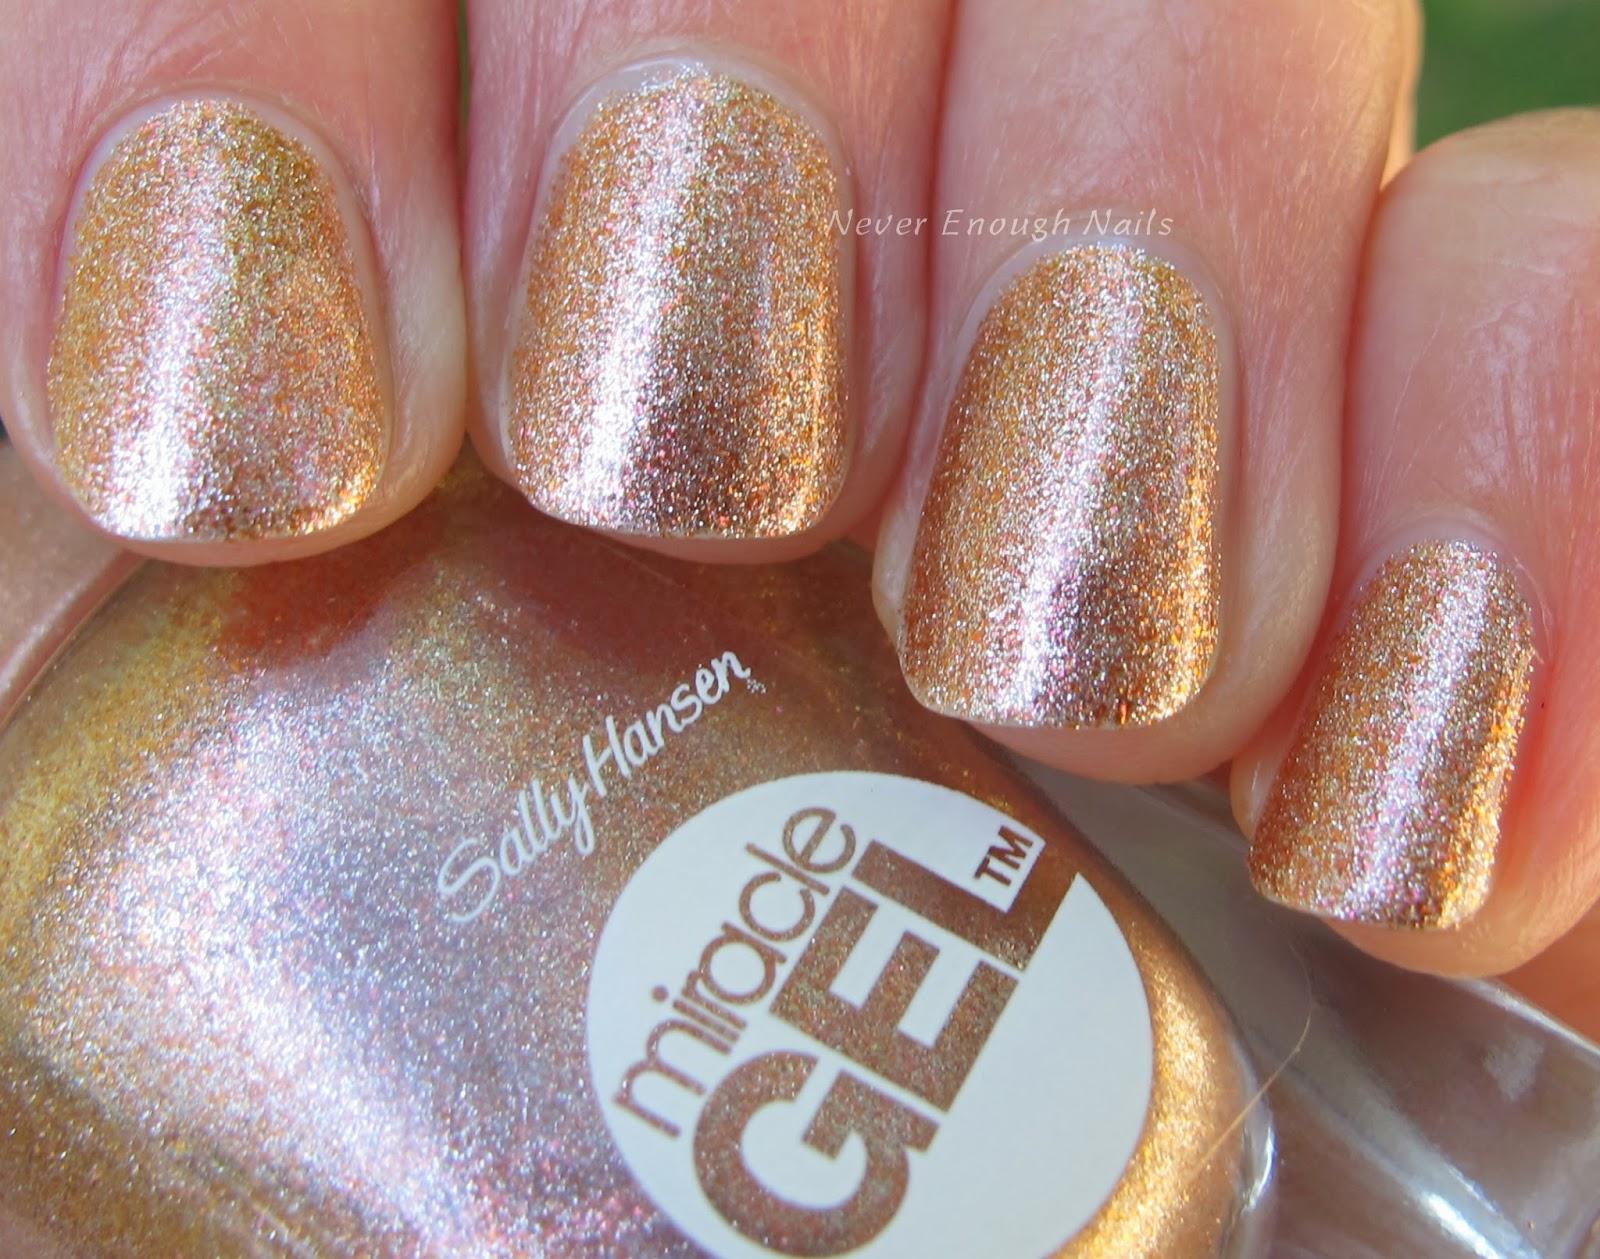 Never Enough Nails: 4 New Sally Hansen Miracle Gel Shades and ...